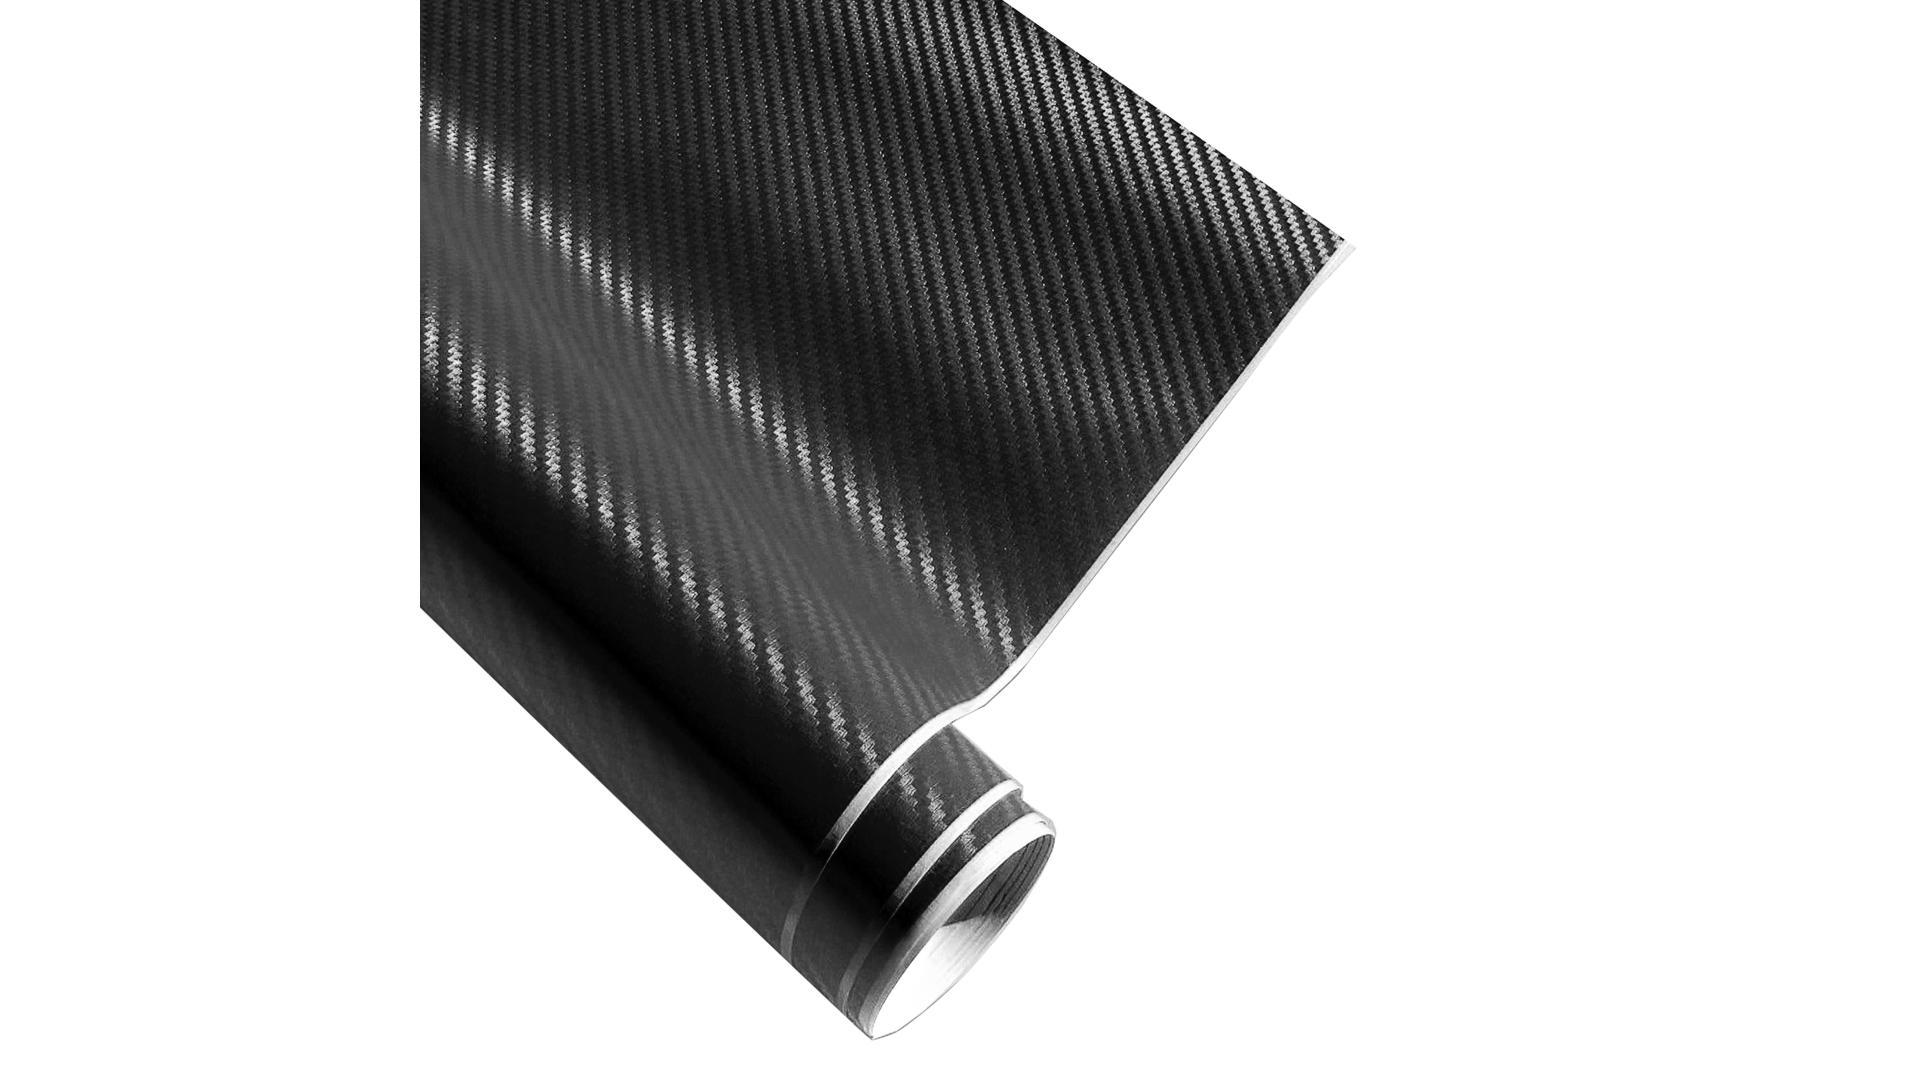 4CARS Fólie 3D CARBON Černá 1.52x1m